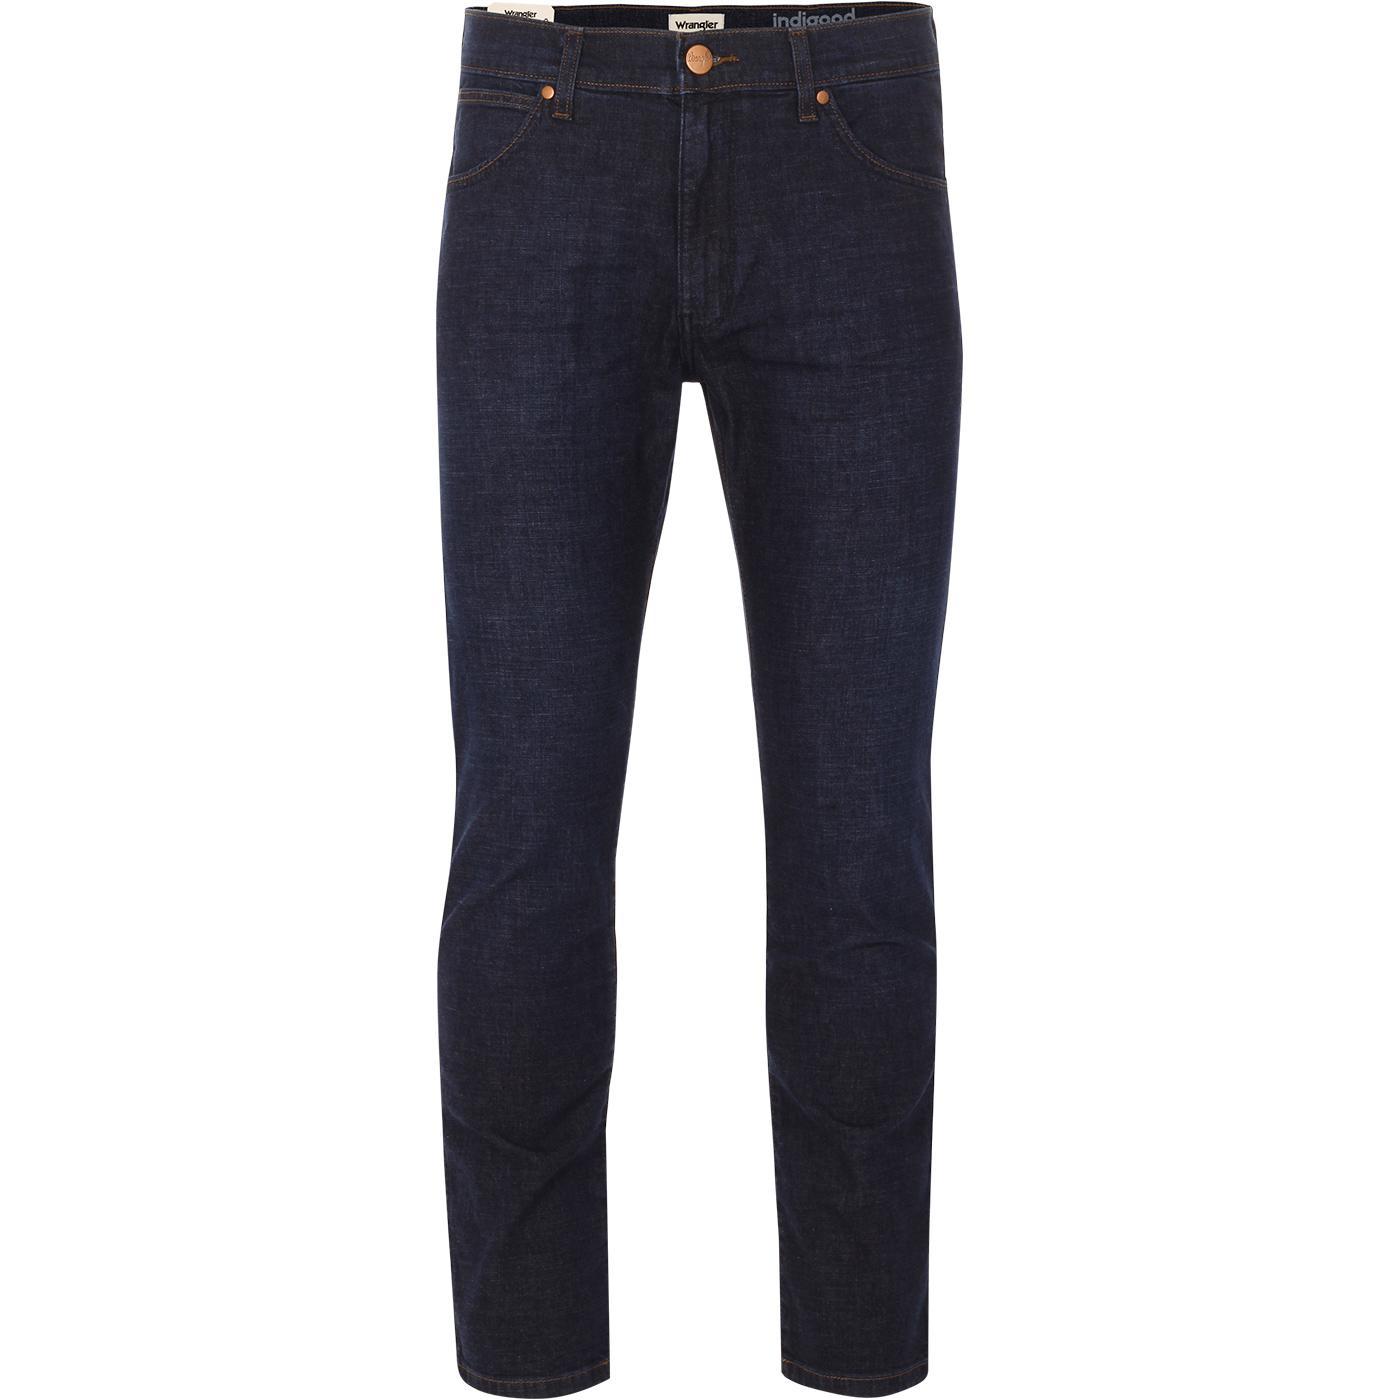 Larston WRANGLER Retro Indigood Jeans (Rinse)